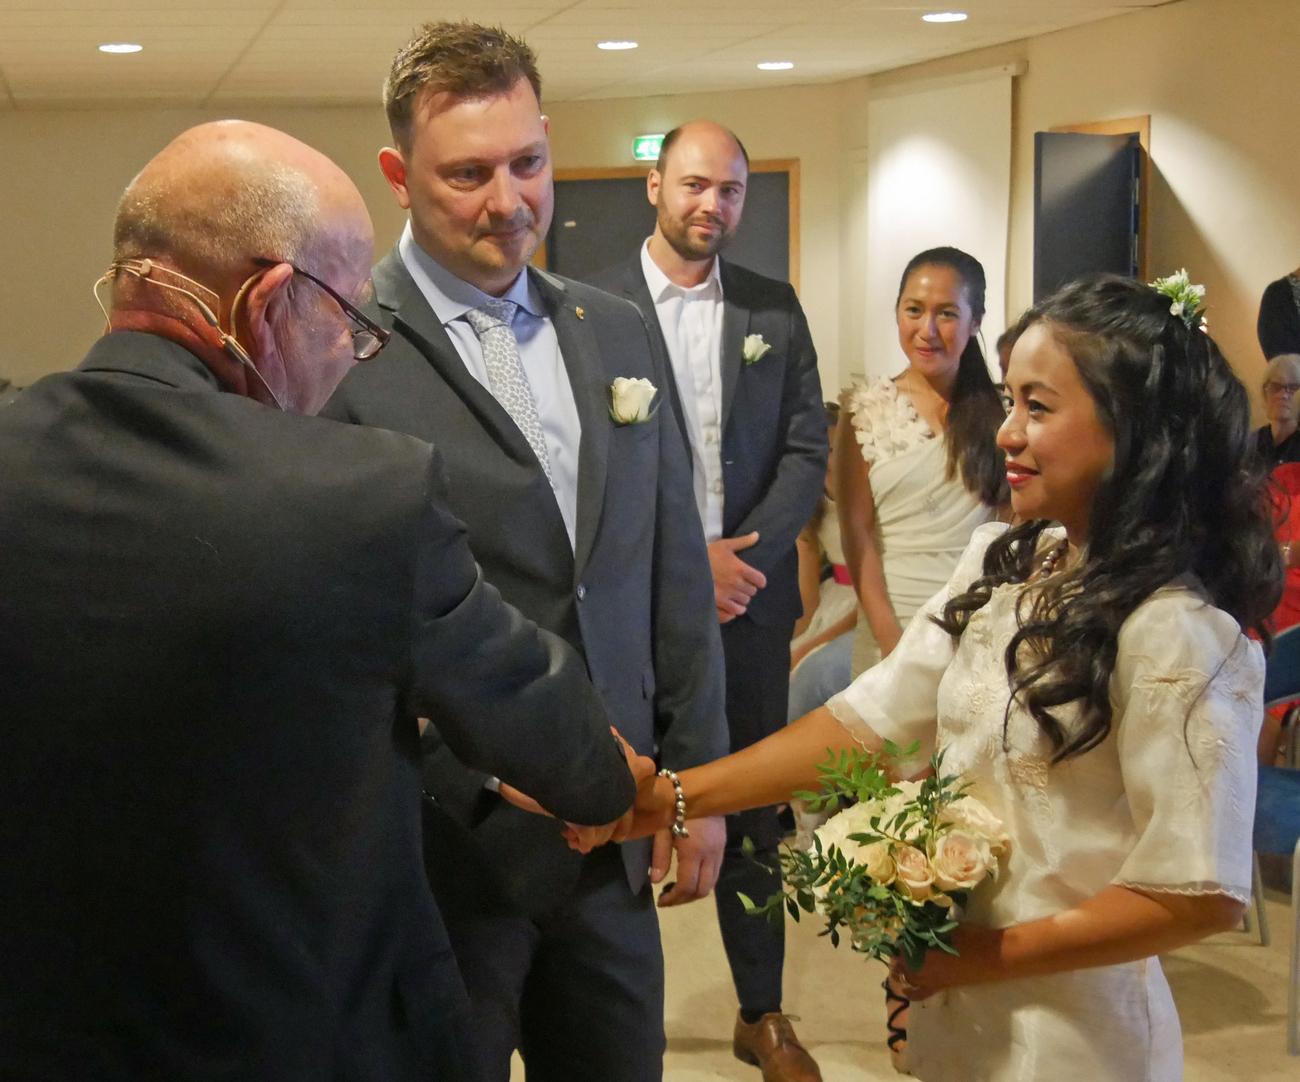 Vinia og Chris med pastor Vidar Bergsland